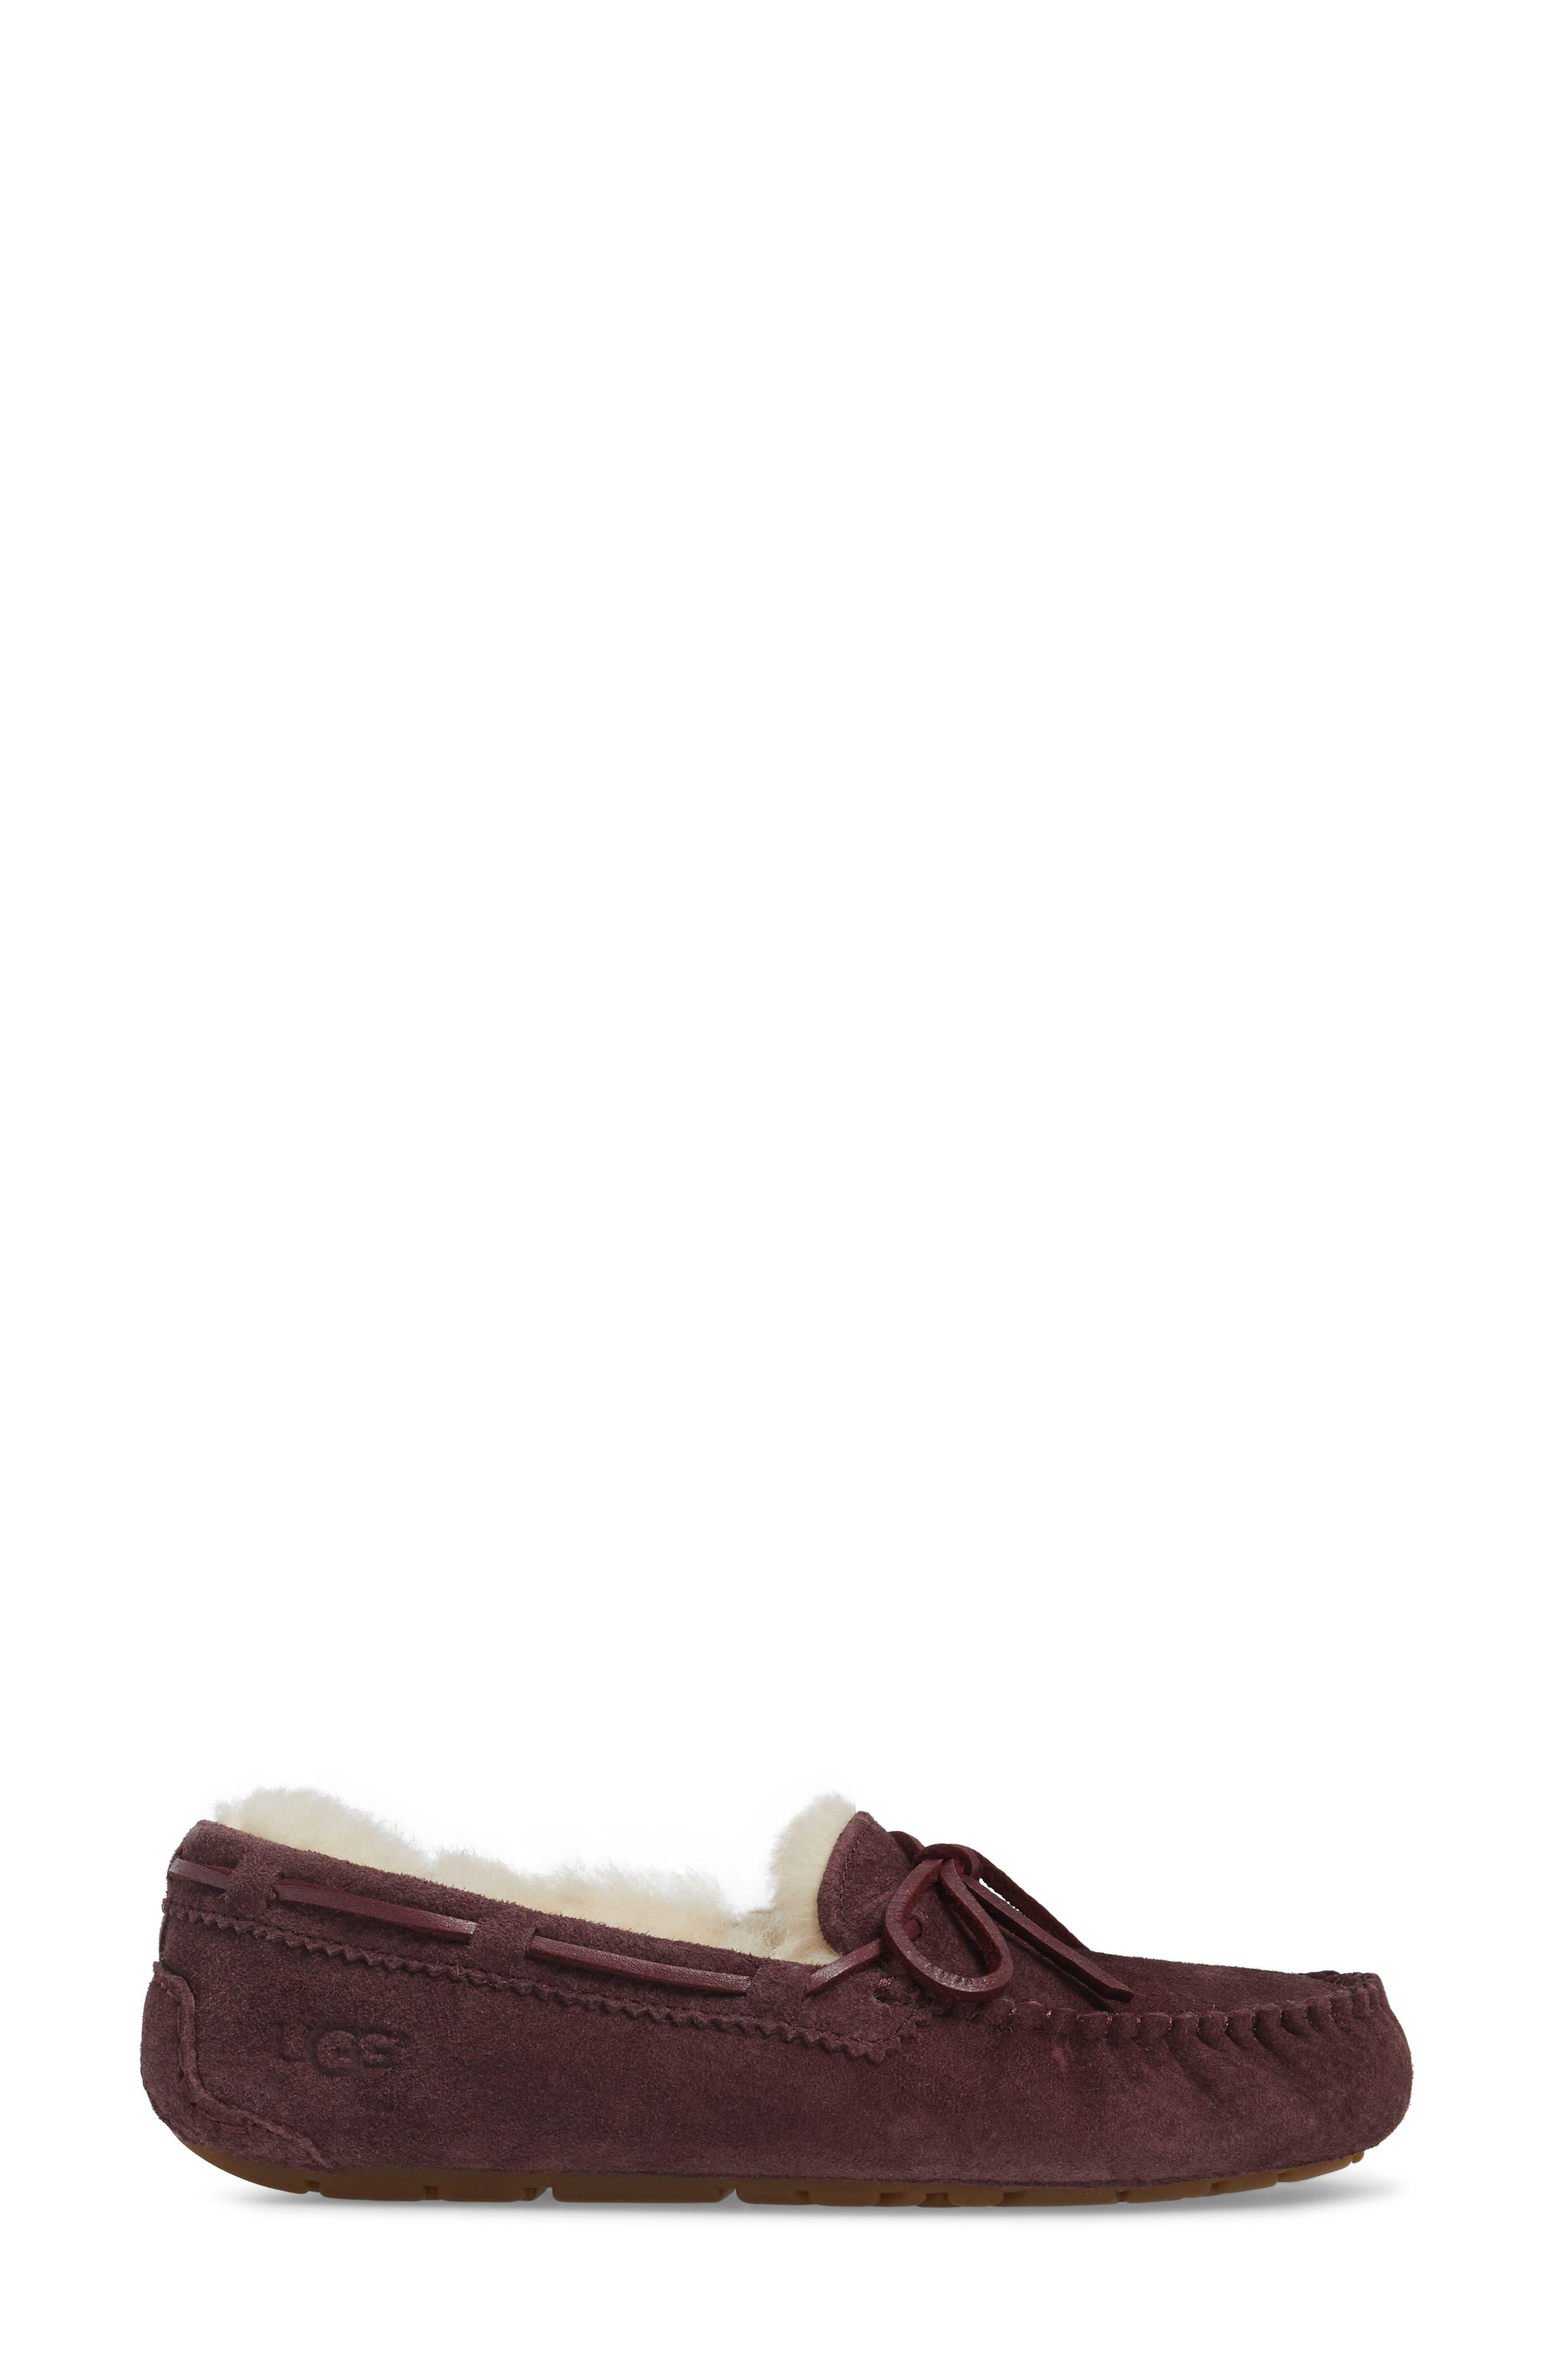 Alternate Image 3  - UGG® Dakota Metallic Slipper (Women)